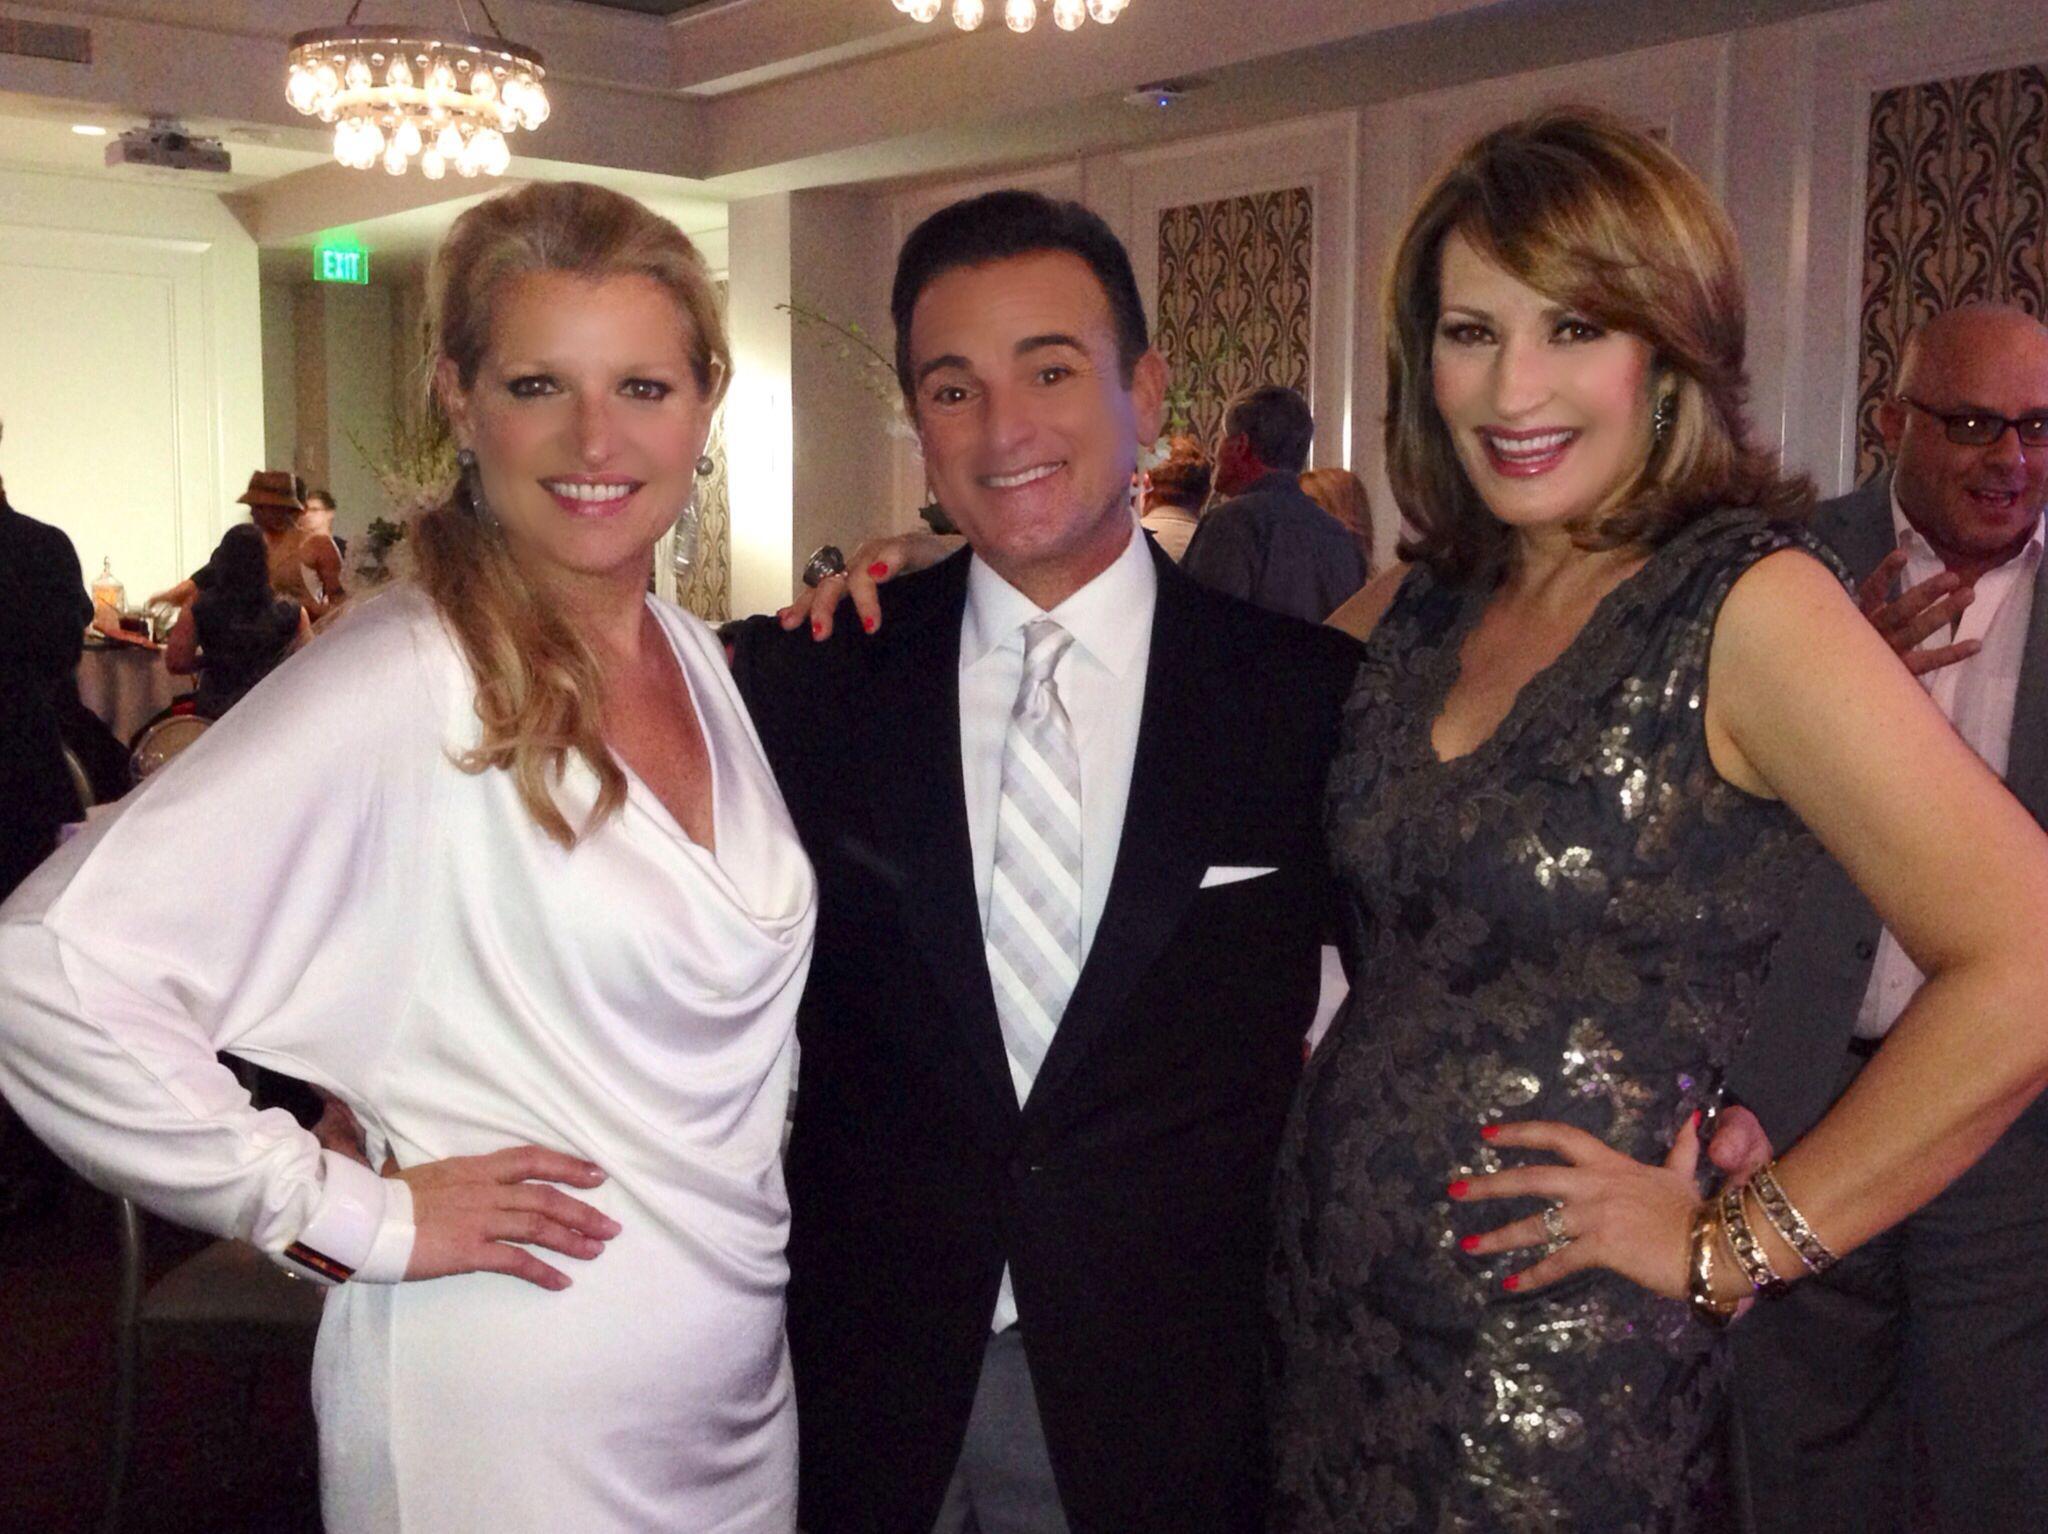 Mindy Grossman Bill Green And Colleen Lopez Hsn Host Anniversary